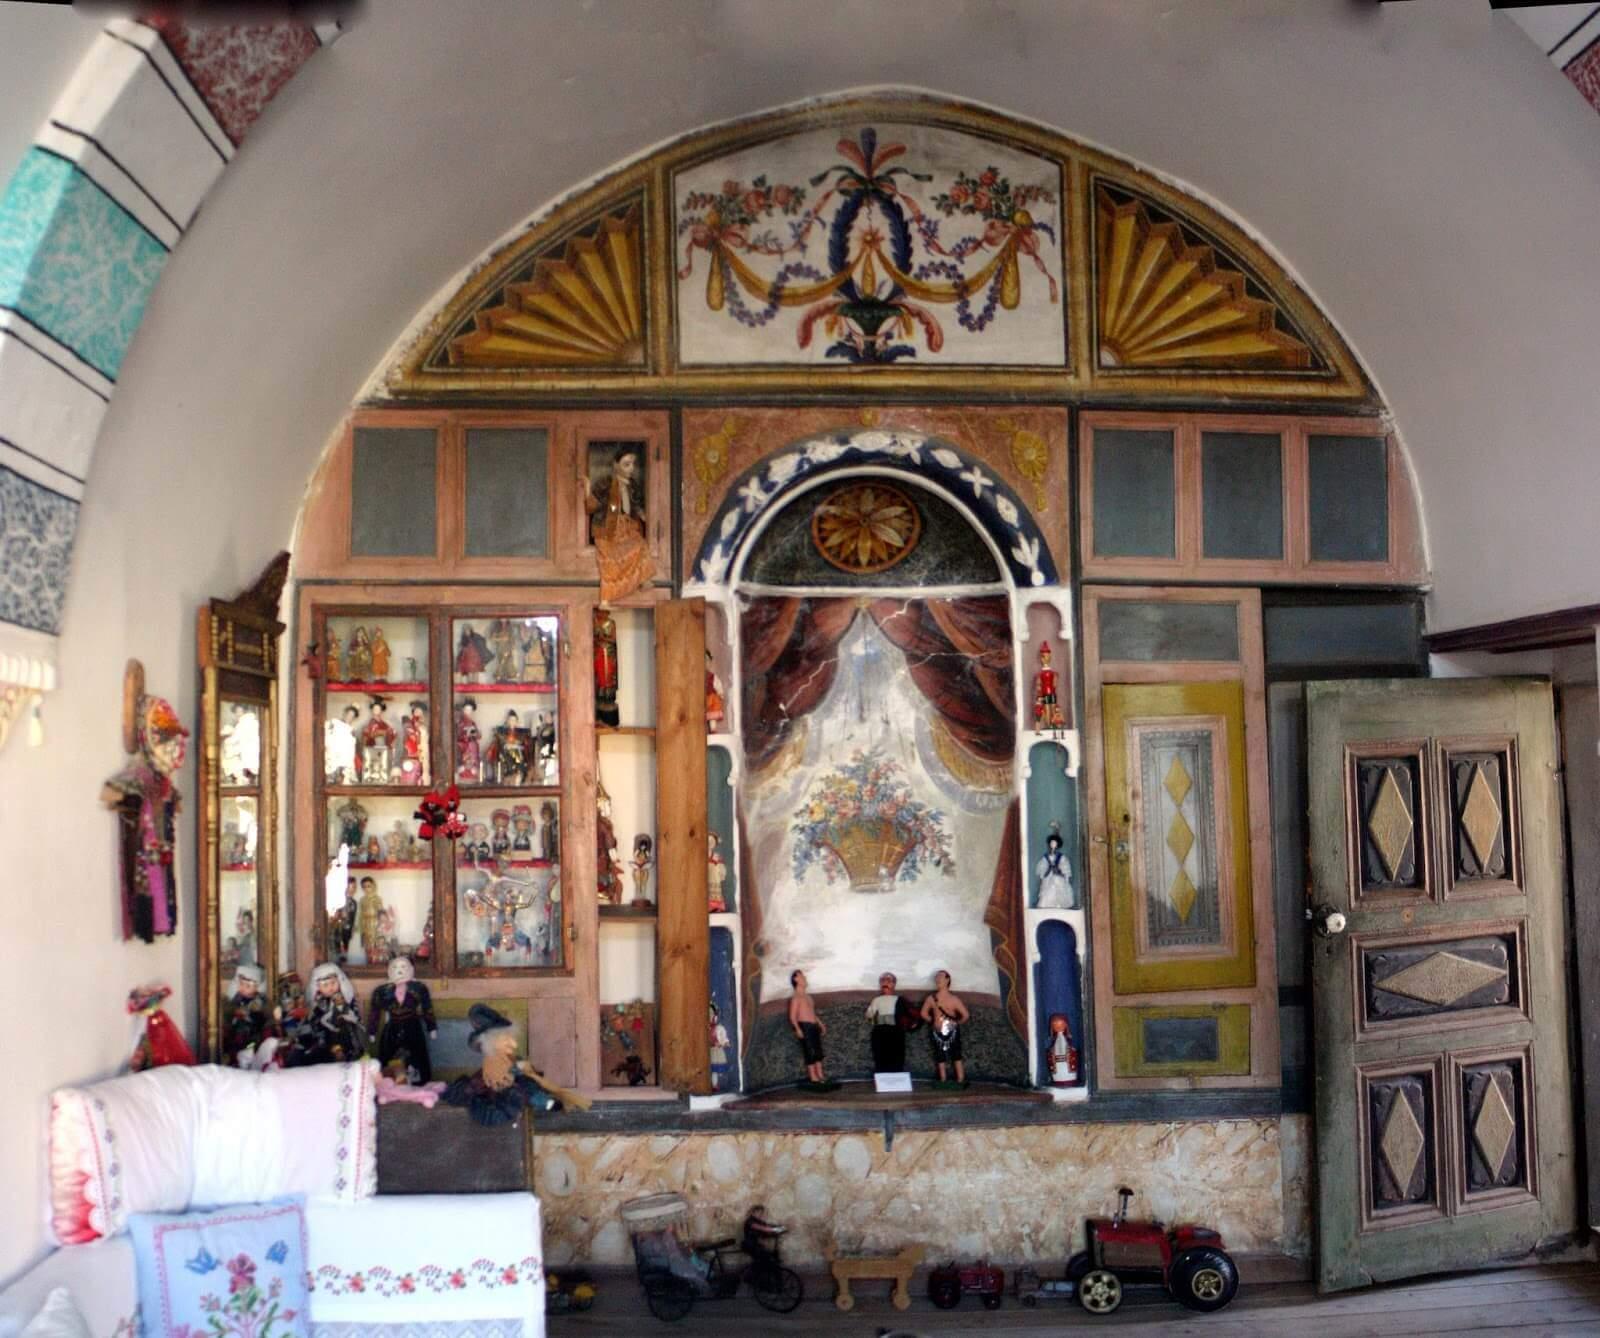 Cappadocia Museum of Art and History / Mustafapaşa - Cappadocia